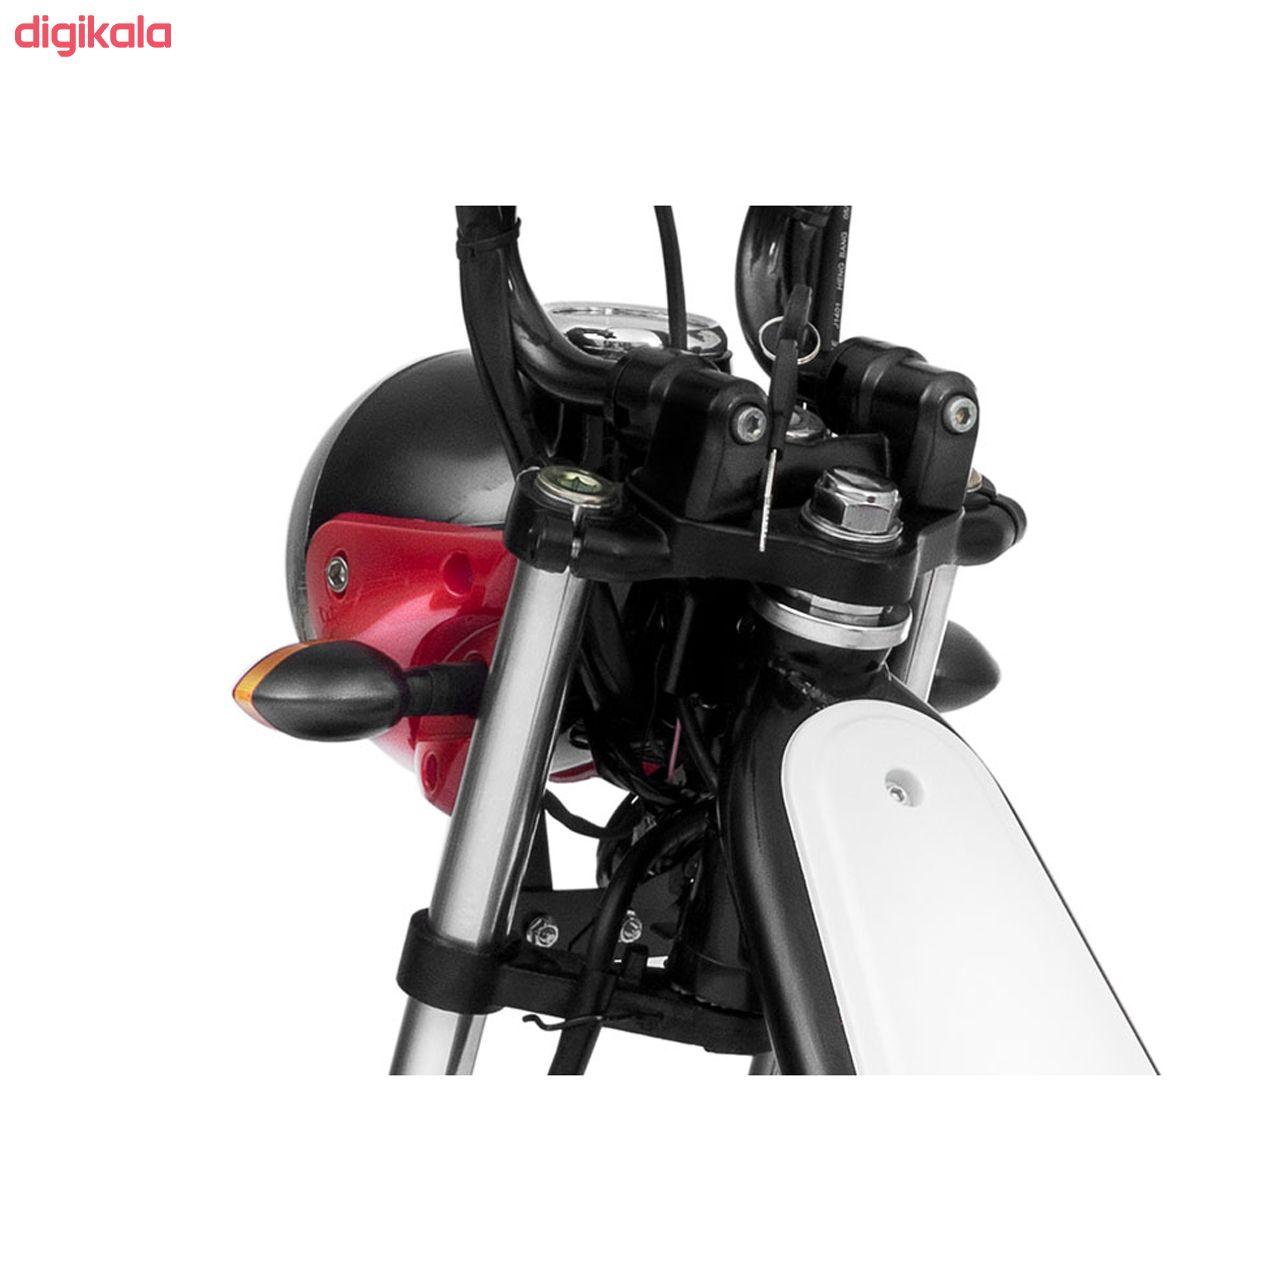 موتورسیکلت  گلکسی مدل 1500ETسی سی سال 1399 main 1 4